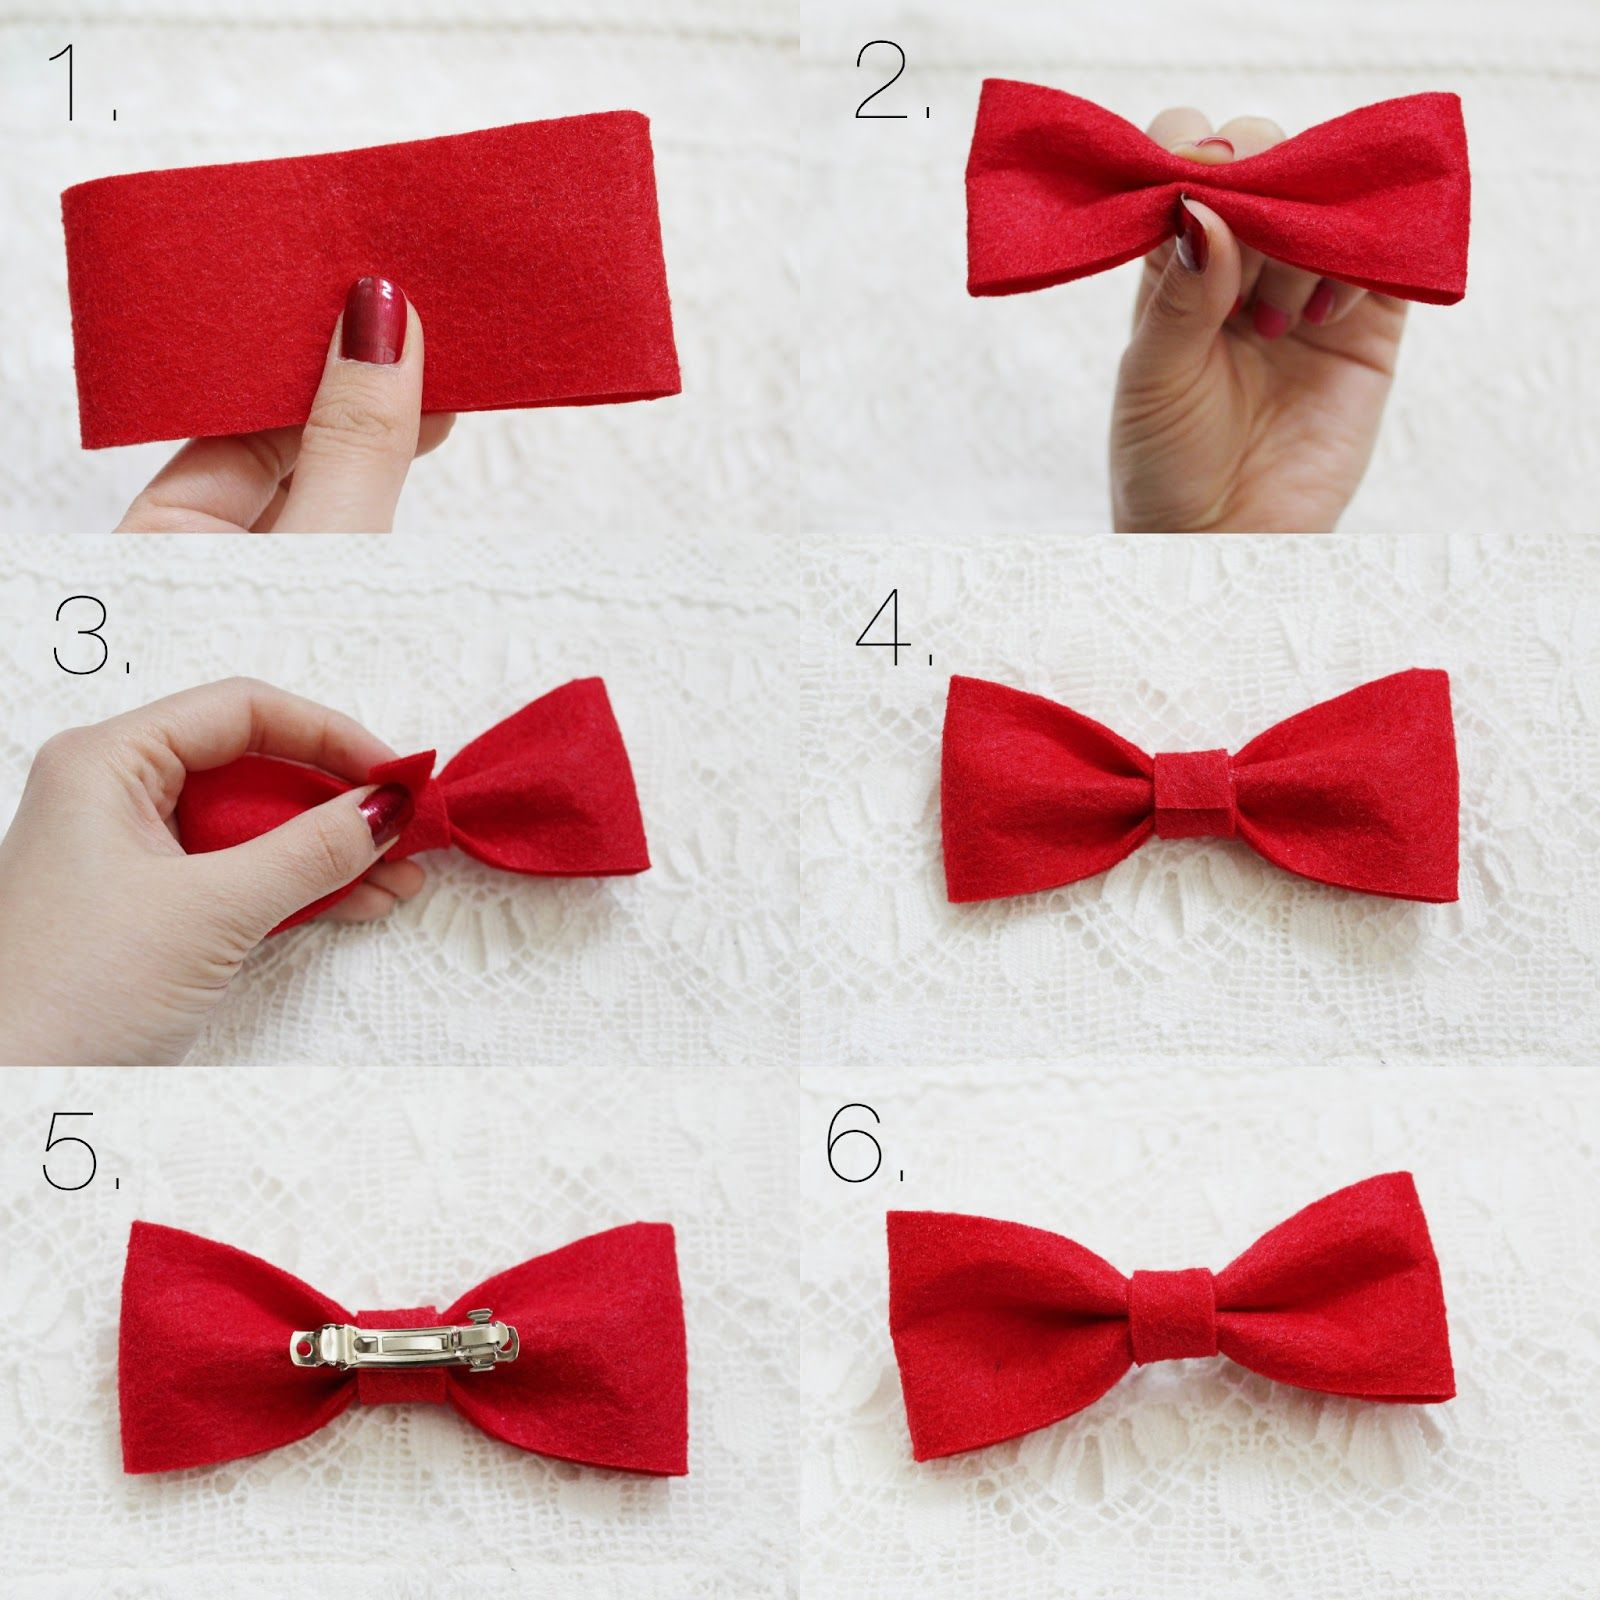 Red bow tutorial diy 3 3 diys and hair pinterest bow red bow tutorial diy 3 3 baditri Image collections